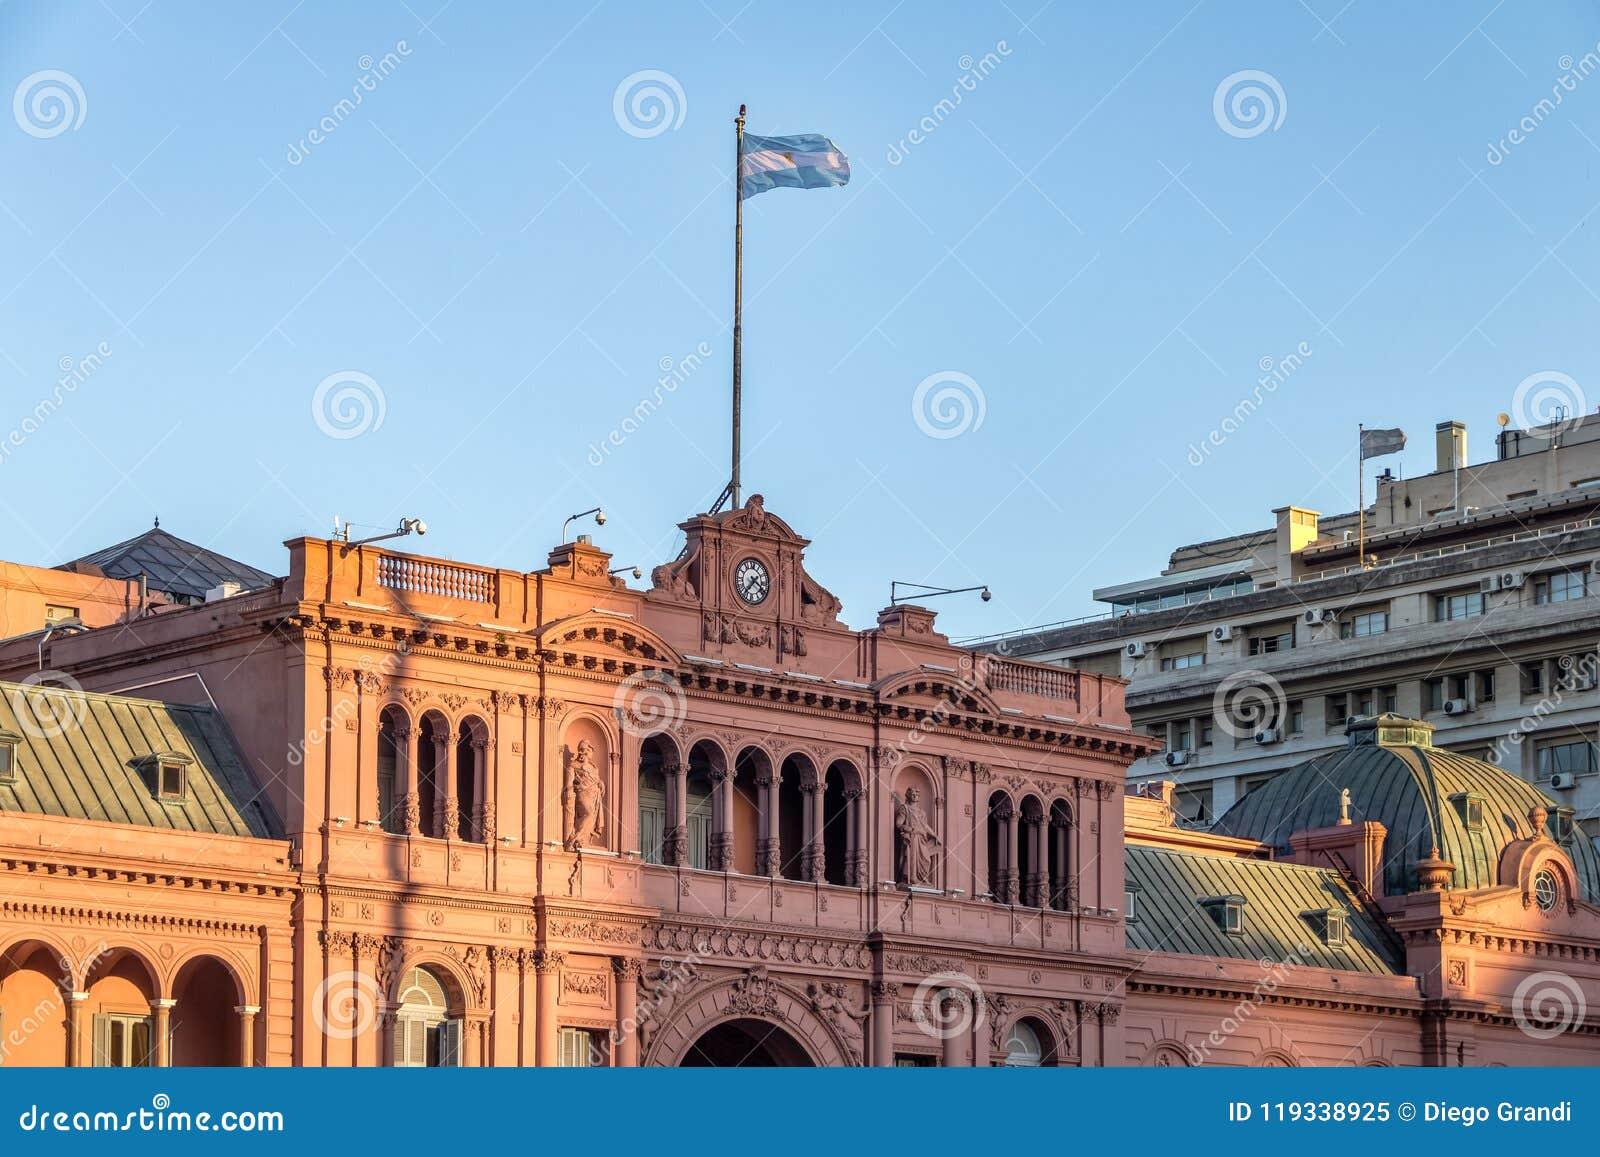 Casa Rosada Presidential Palace - Buenos Aires, Argentina